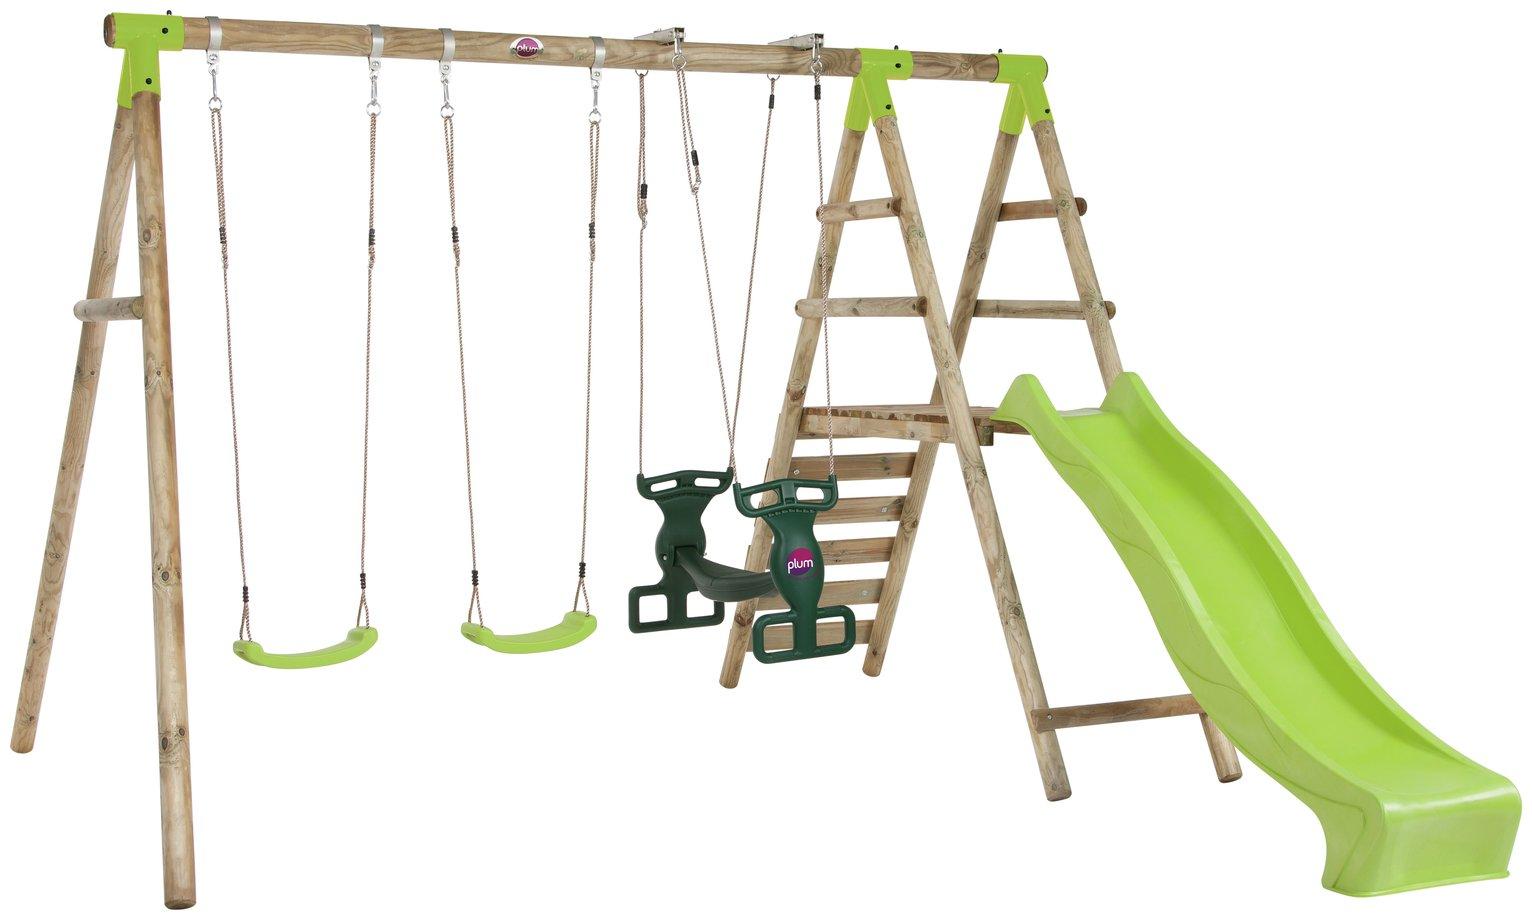 Plum Silverback Wooden Garden Swing Set.